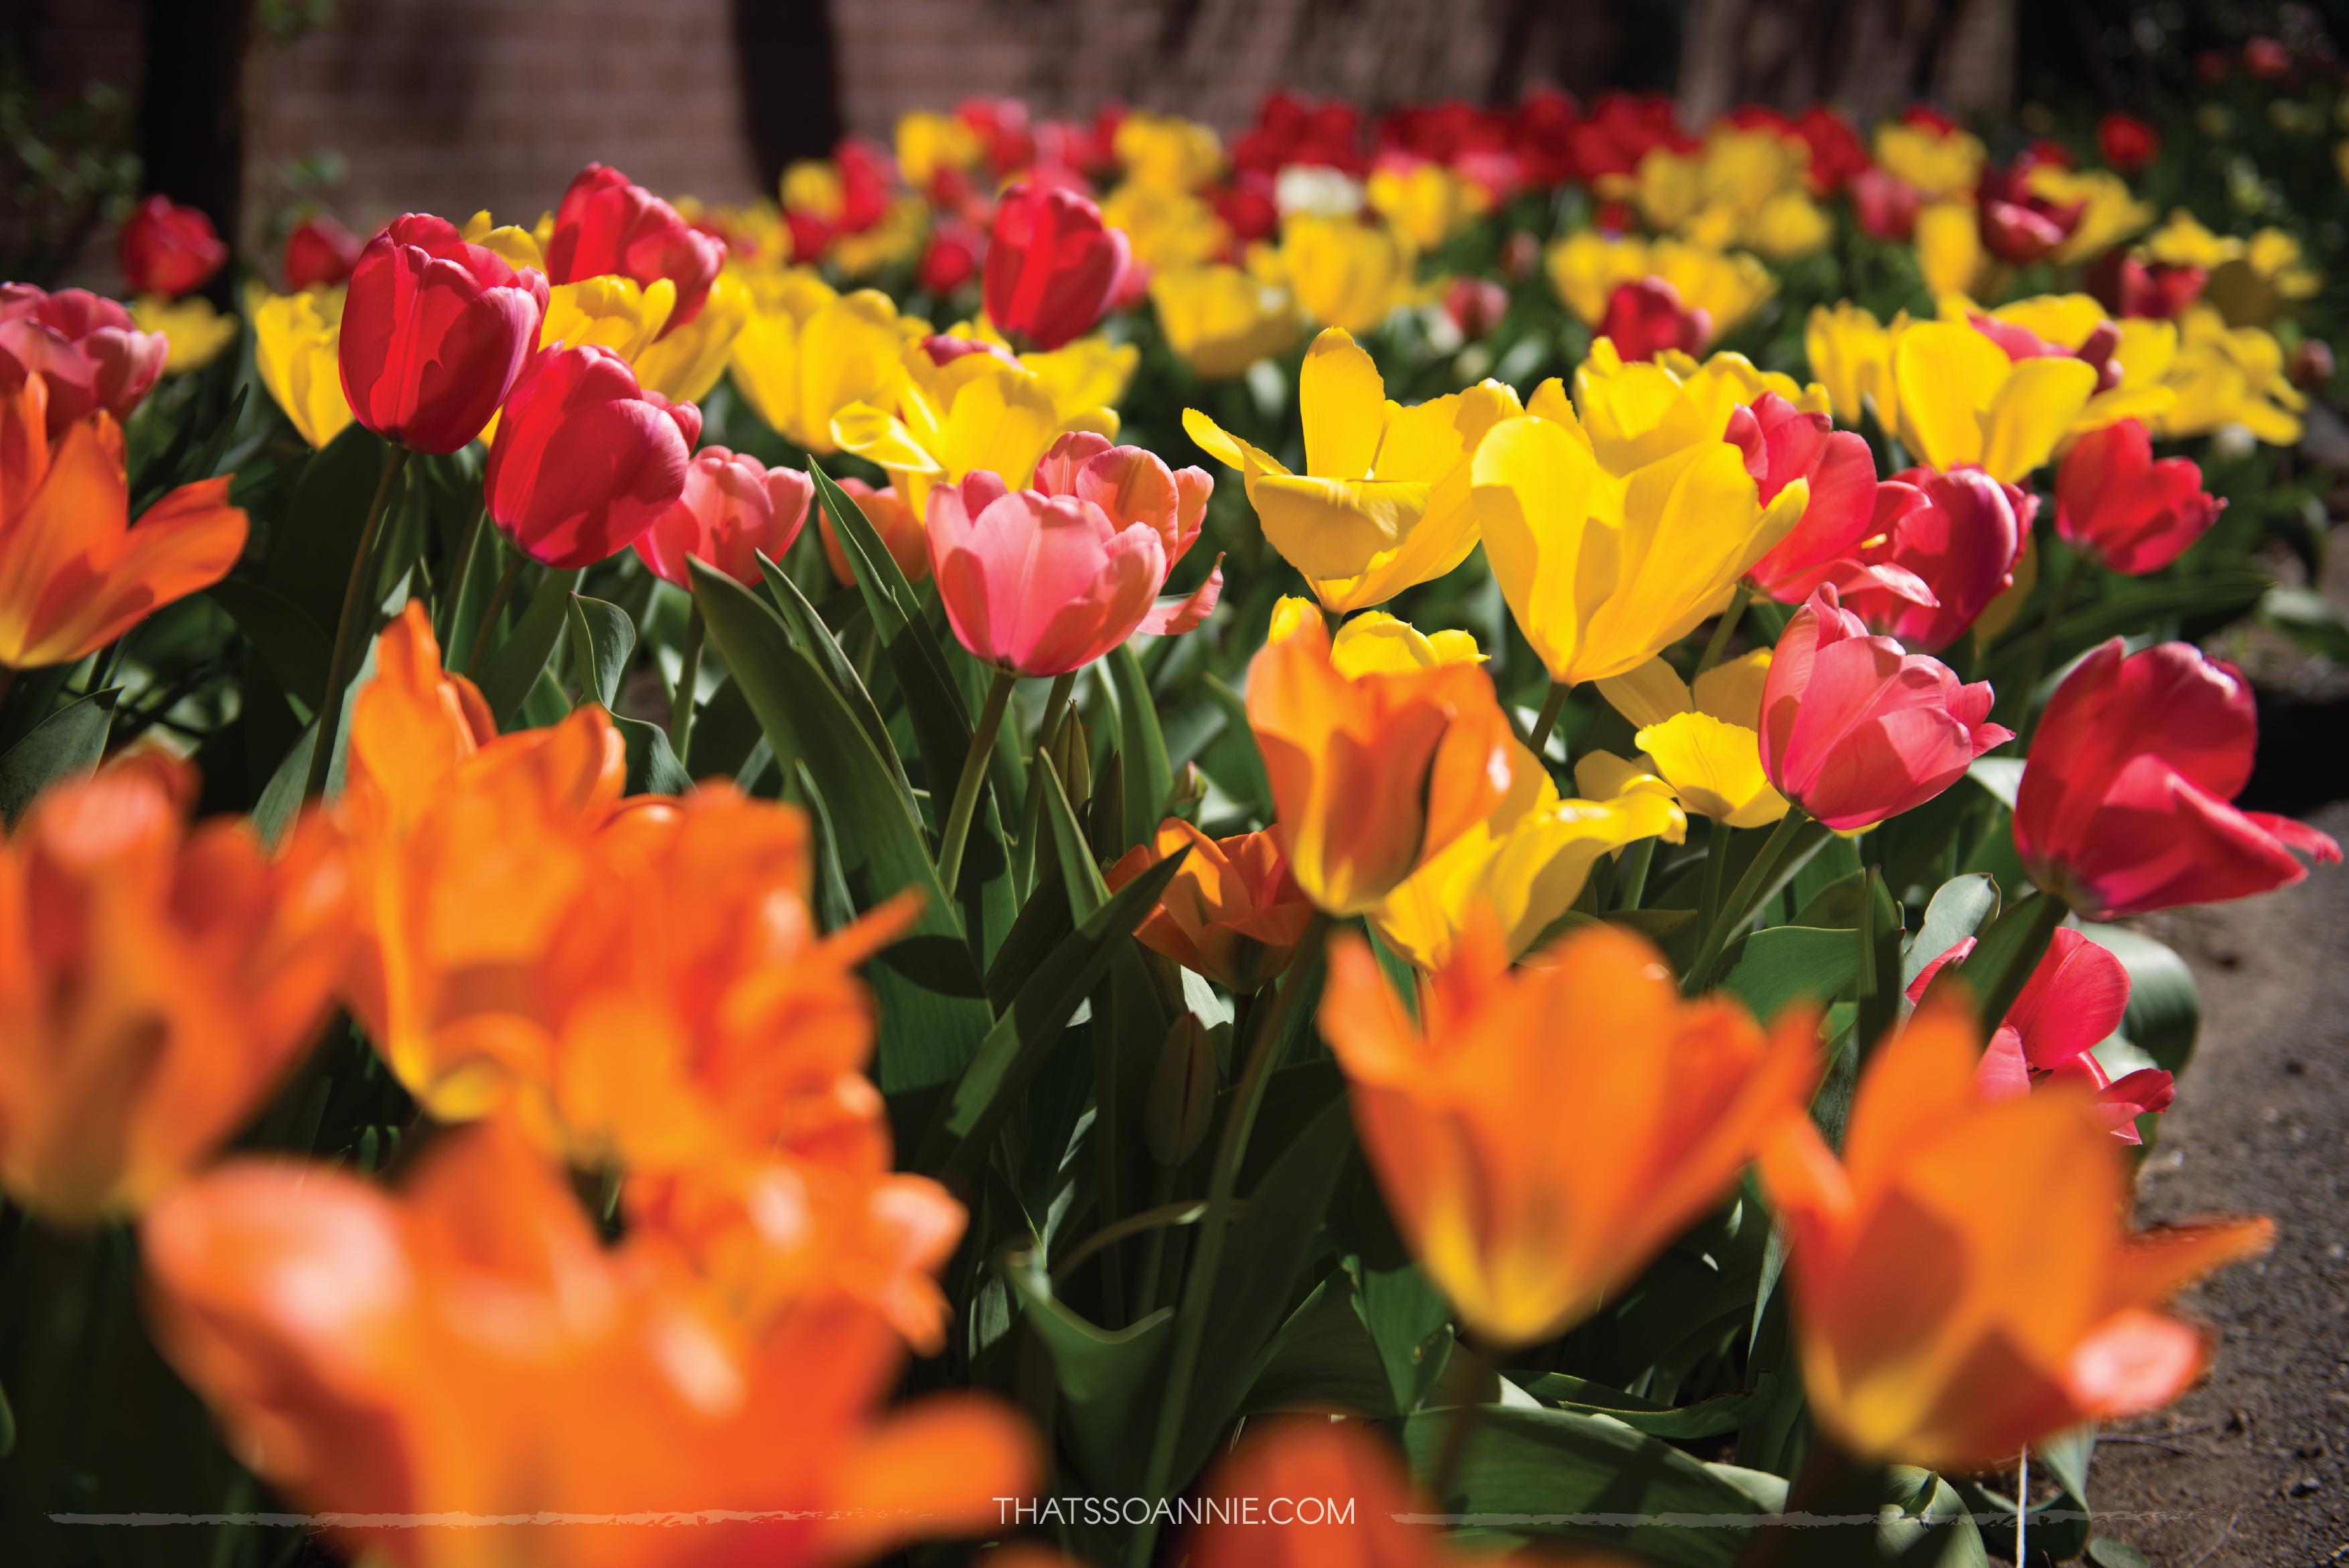 NYC Tulip Festival @ West Side Community Garden